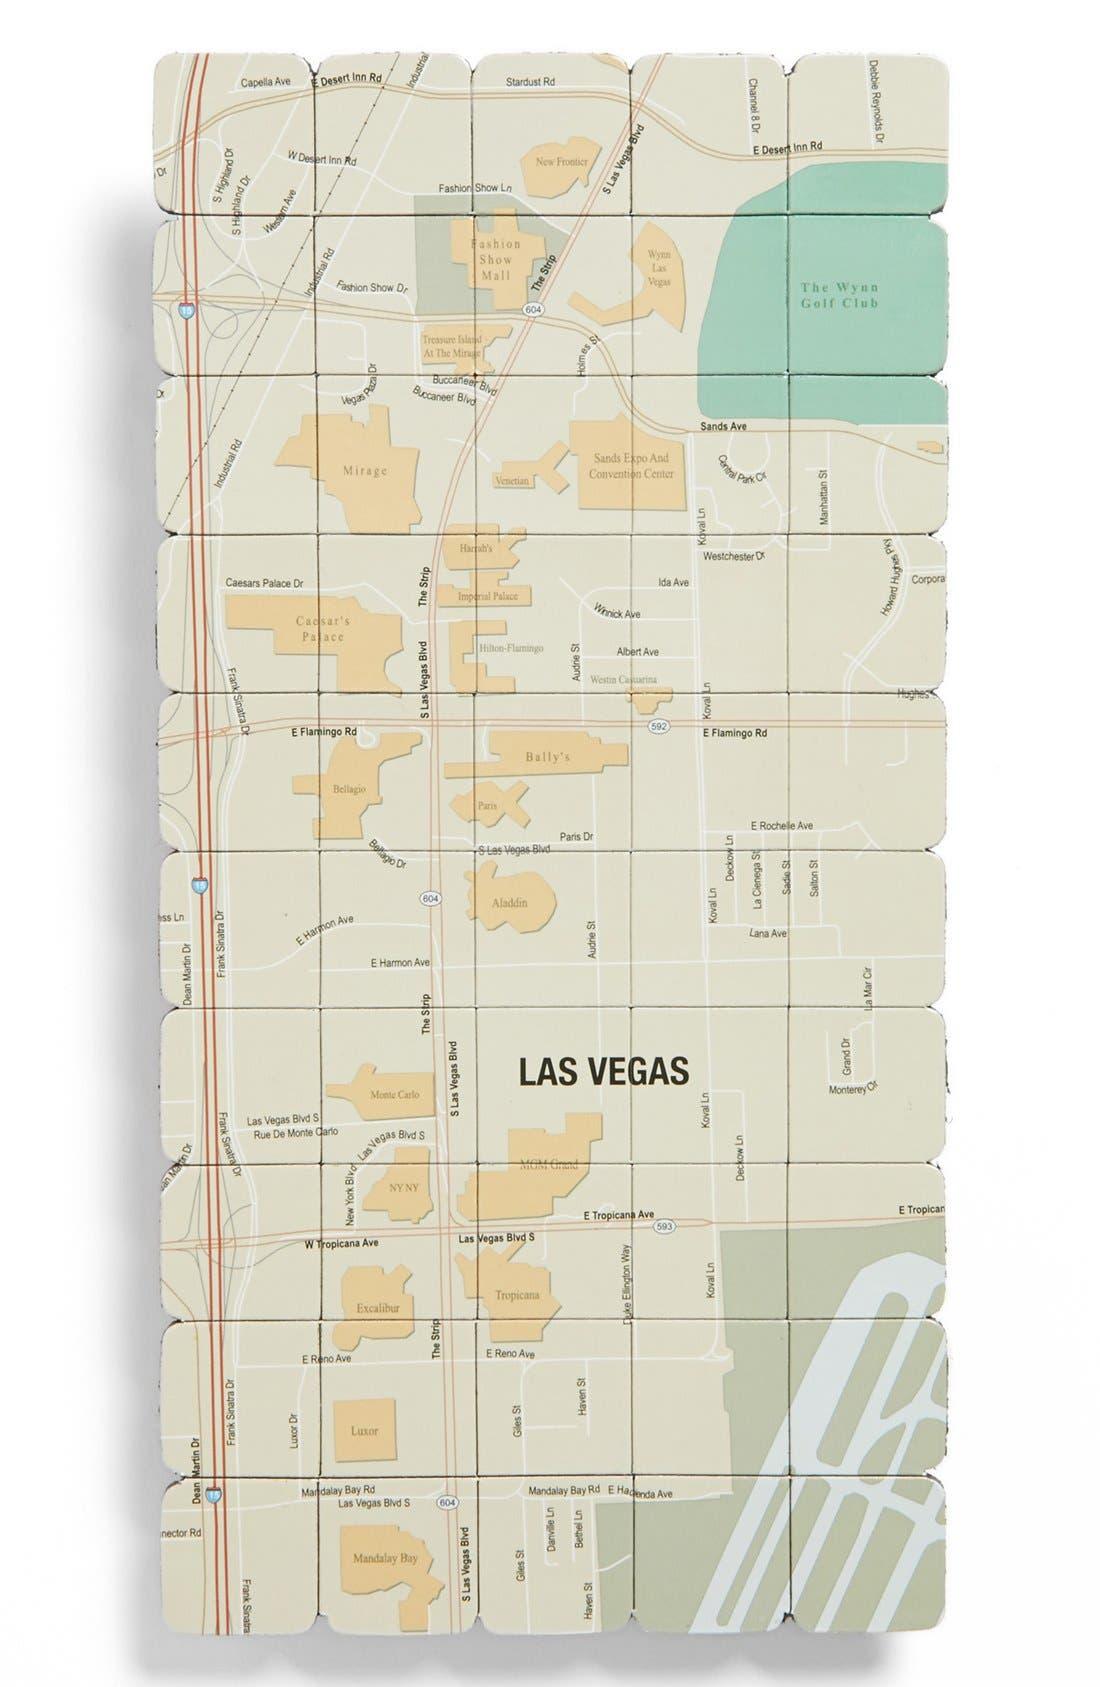 Alternate Image 1 Selected - Design Ideas Las Vegas Map Magnet